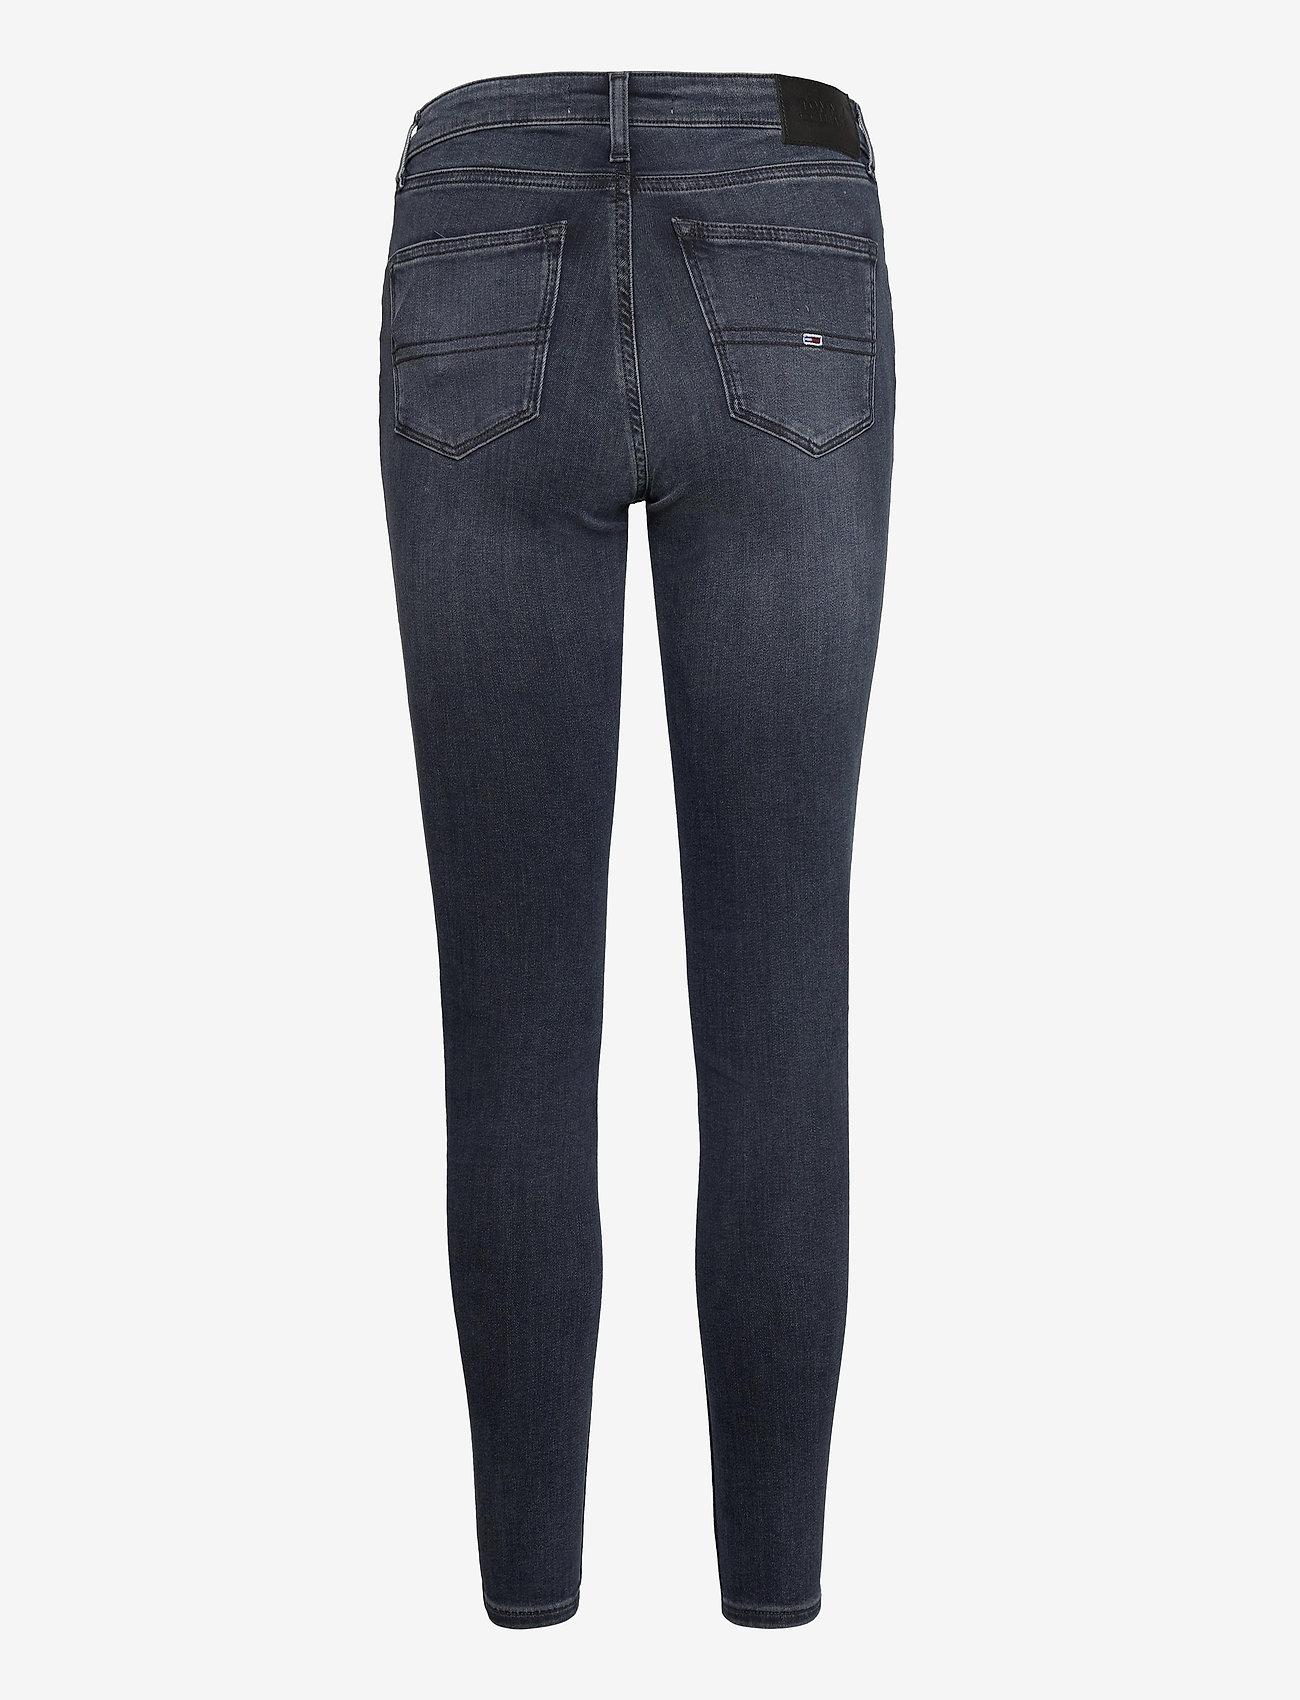 Tommy Jeans - NORA MR SKNY ABBS - skinny jeans - albany bl bk str - 1